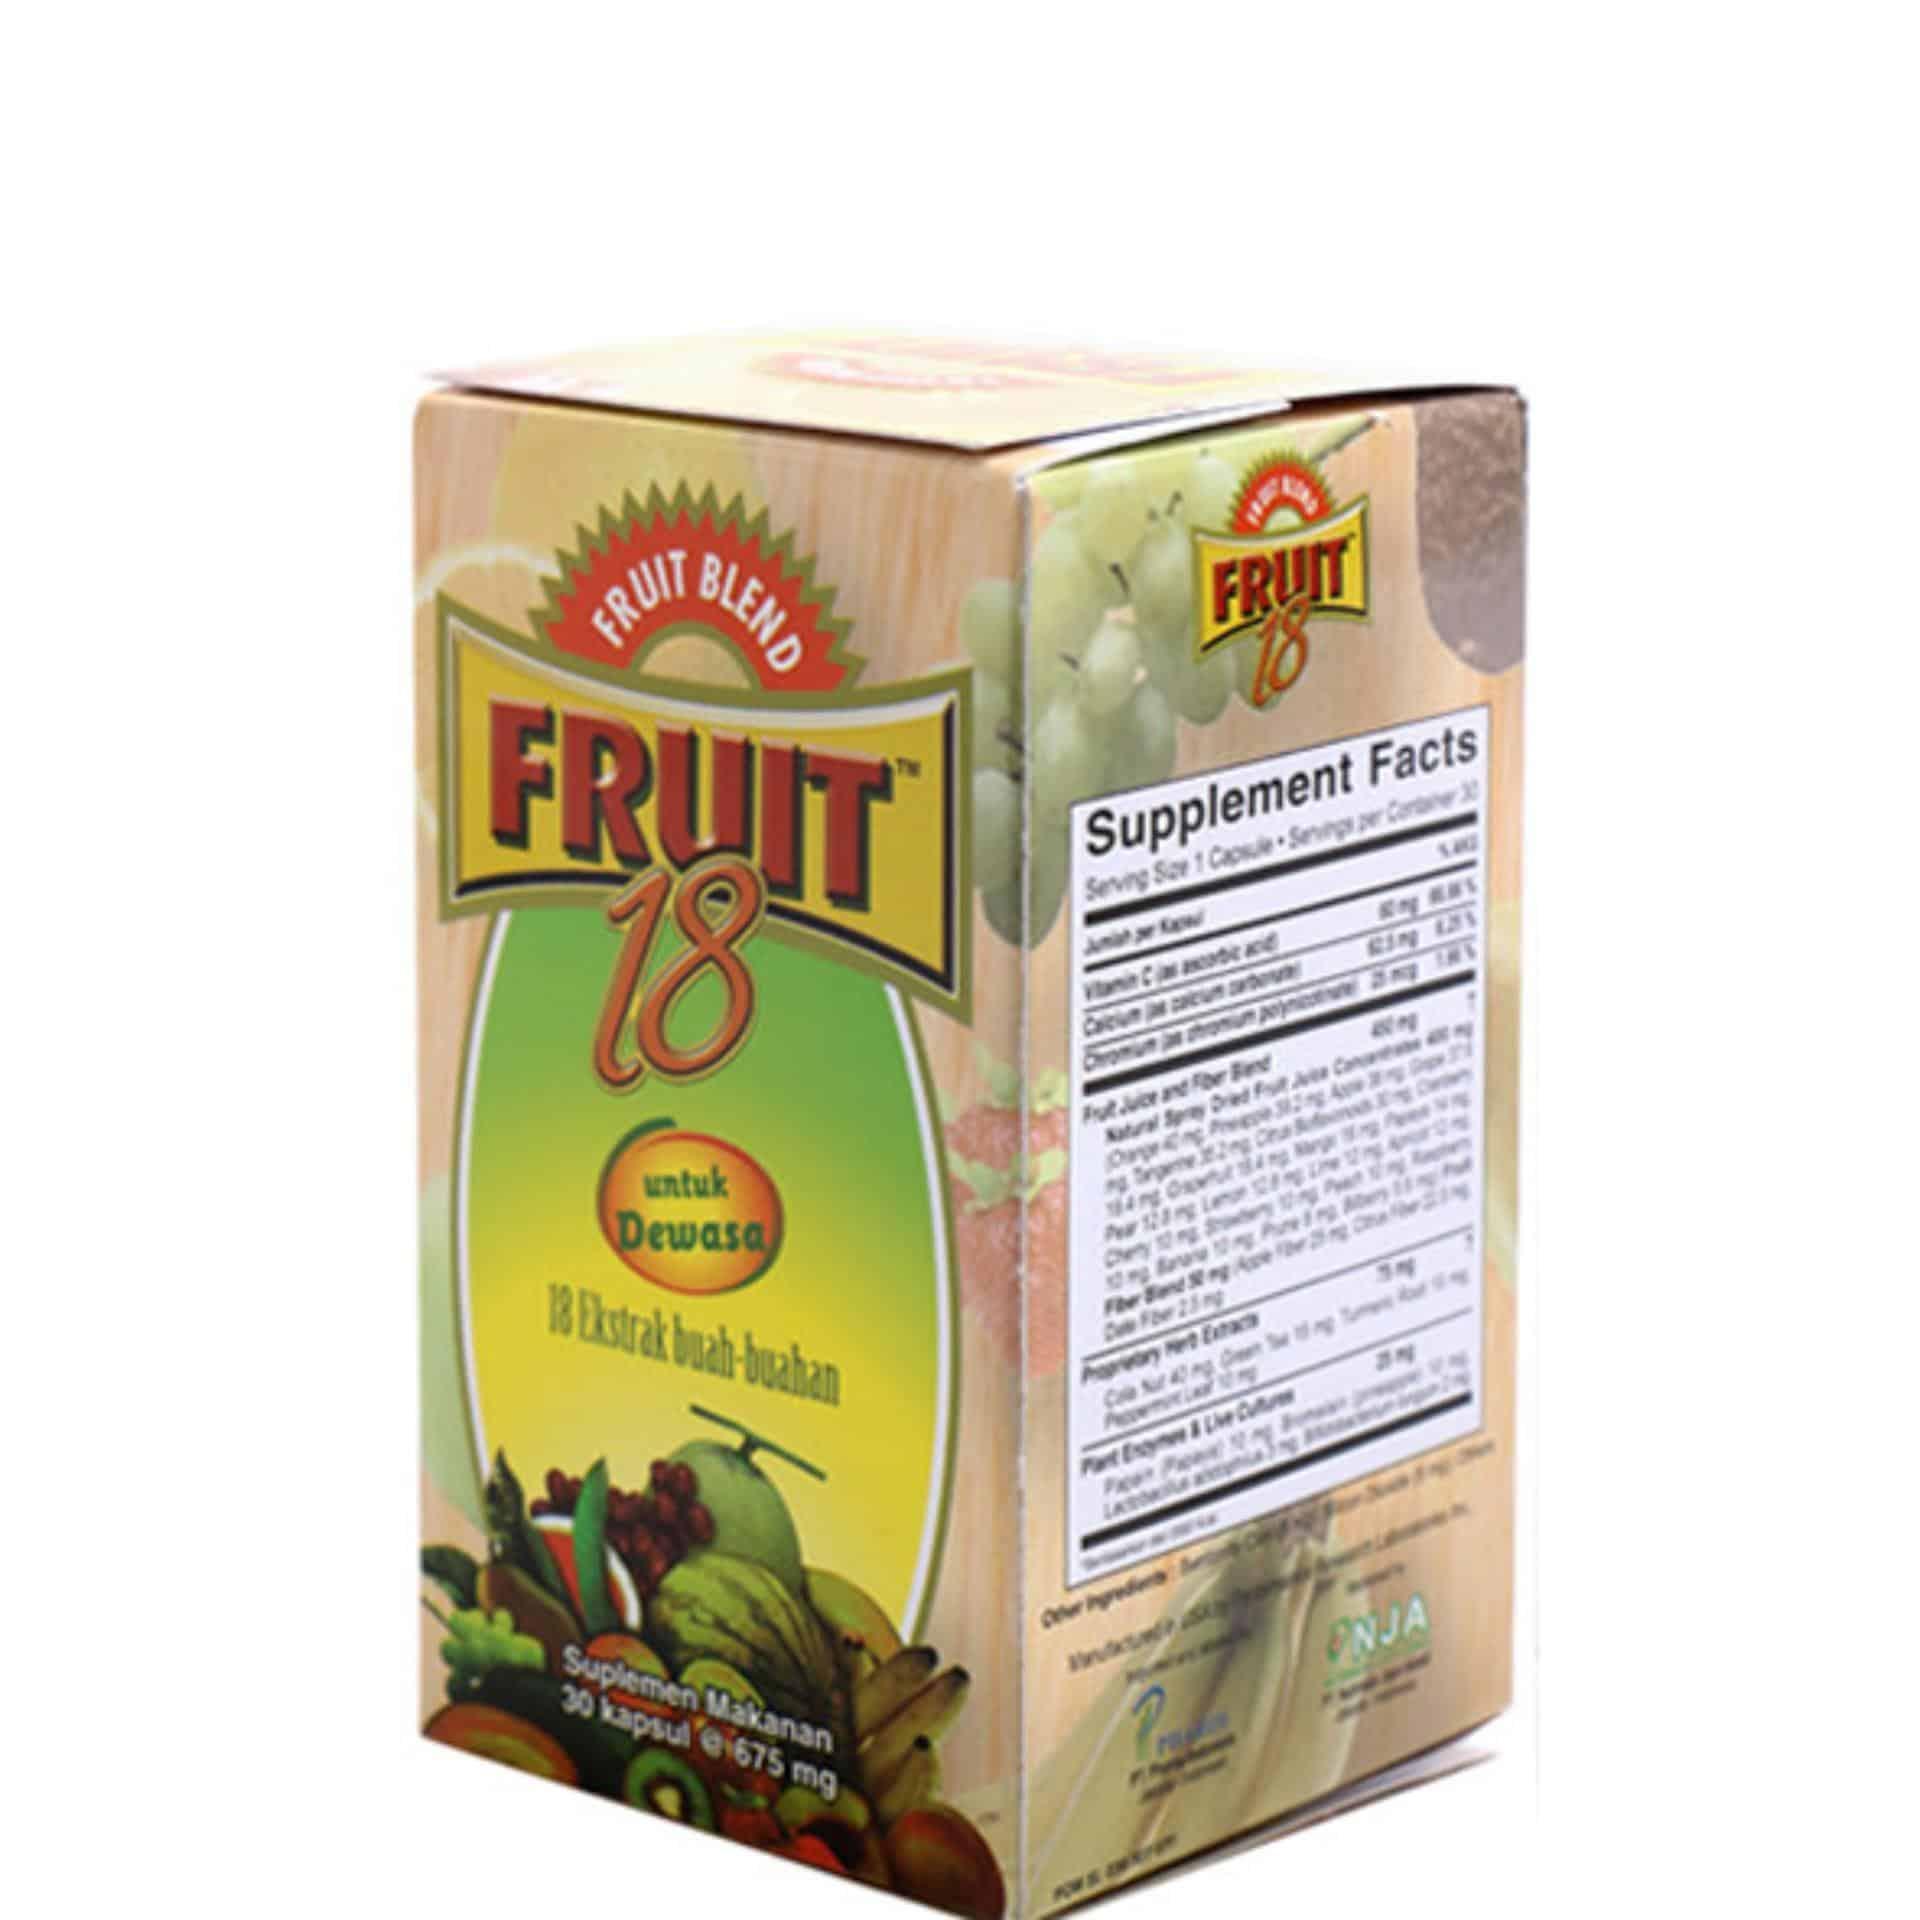 Fruit-18